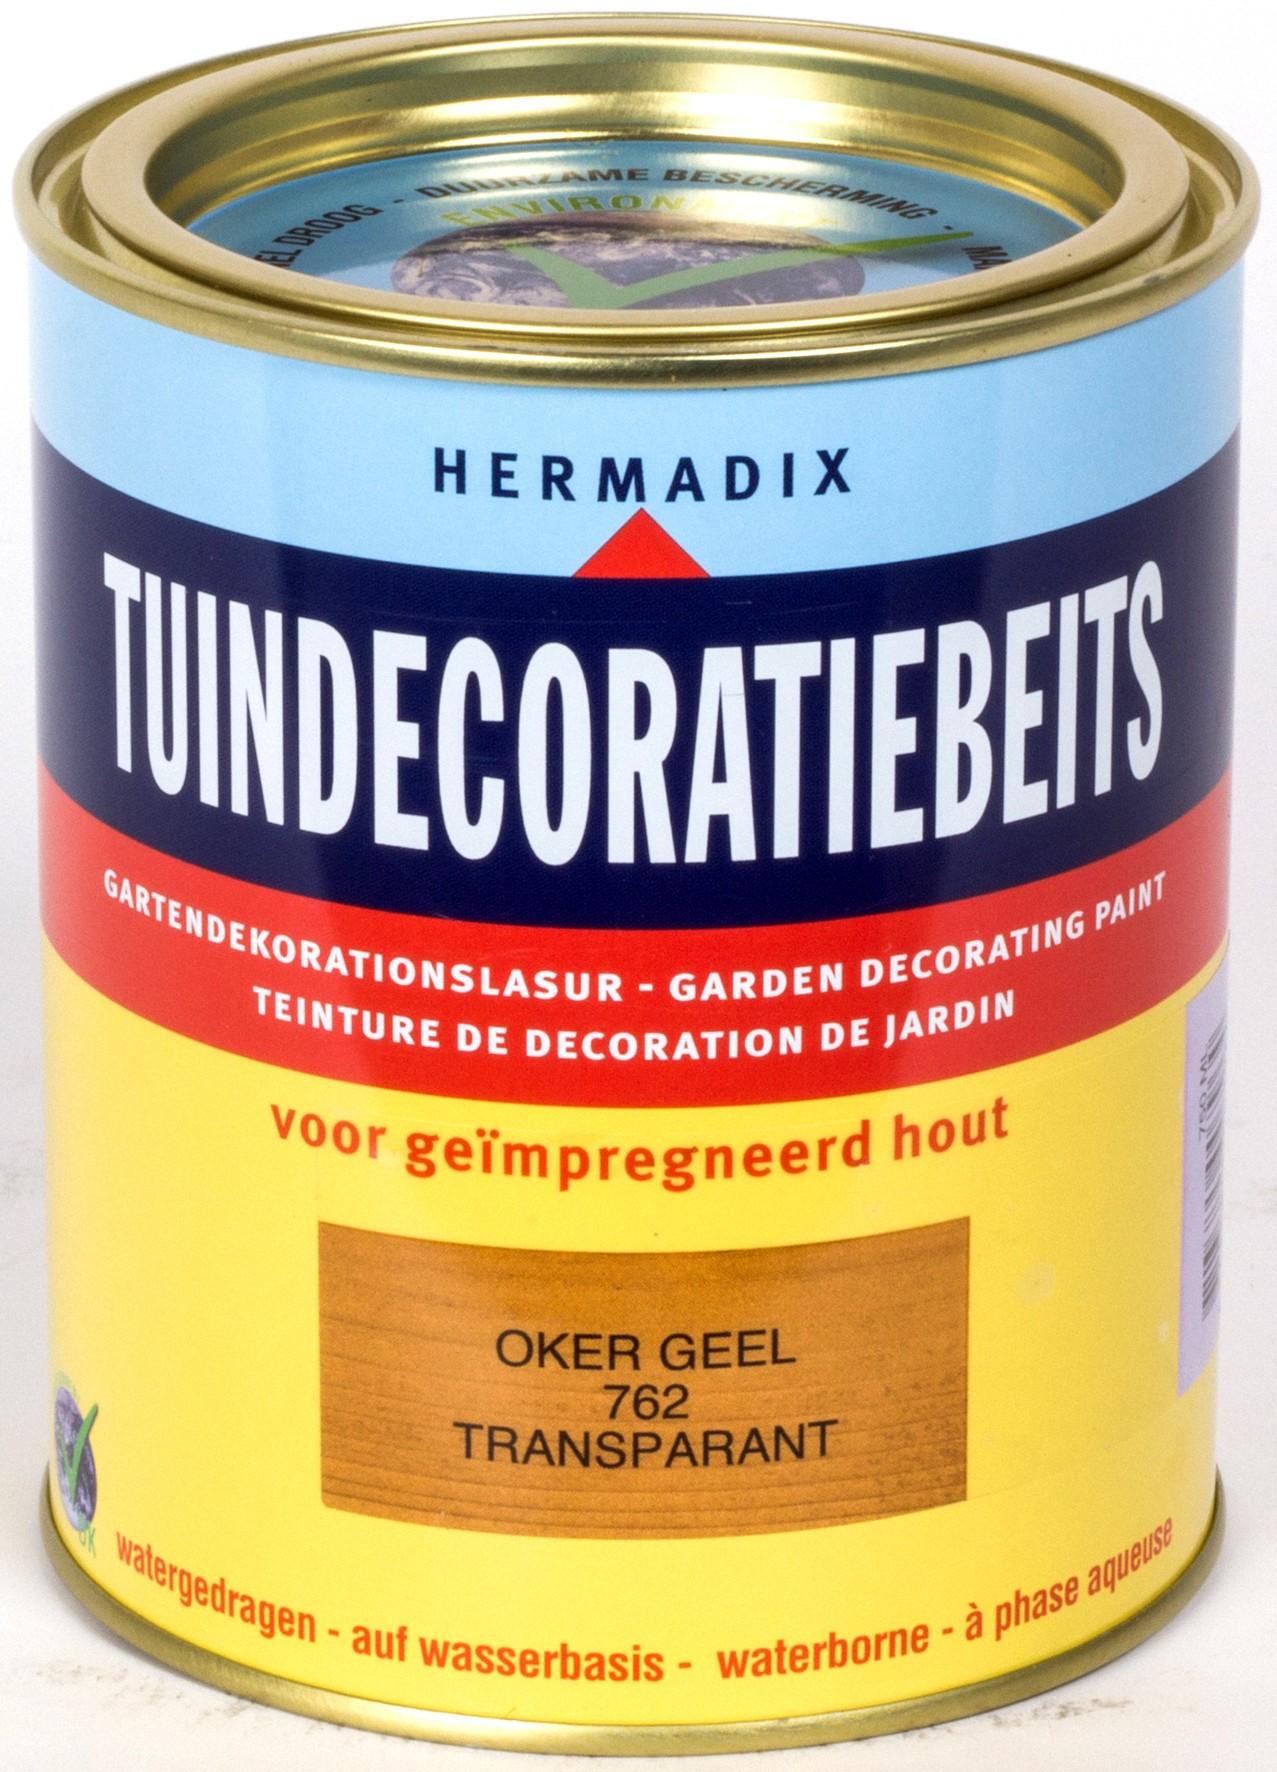 Hermadix beits Hermadix tuindecoratiebeits, transparant, nr. 762 oker geel, blik 0,75 liter